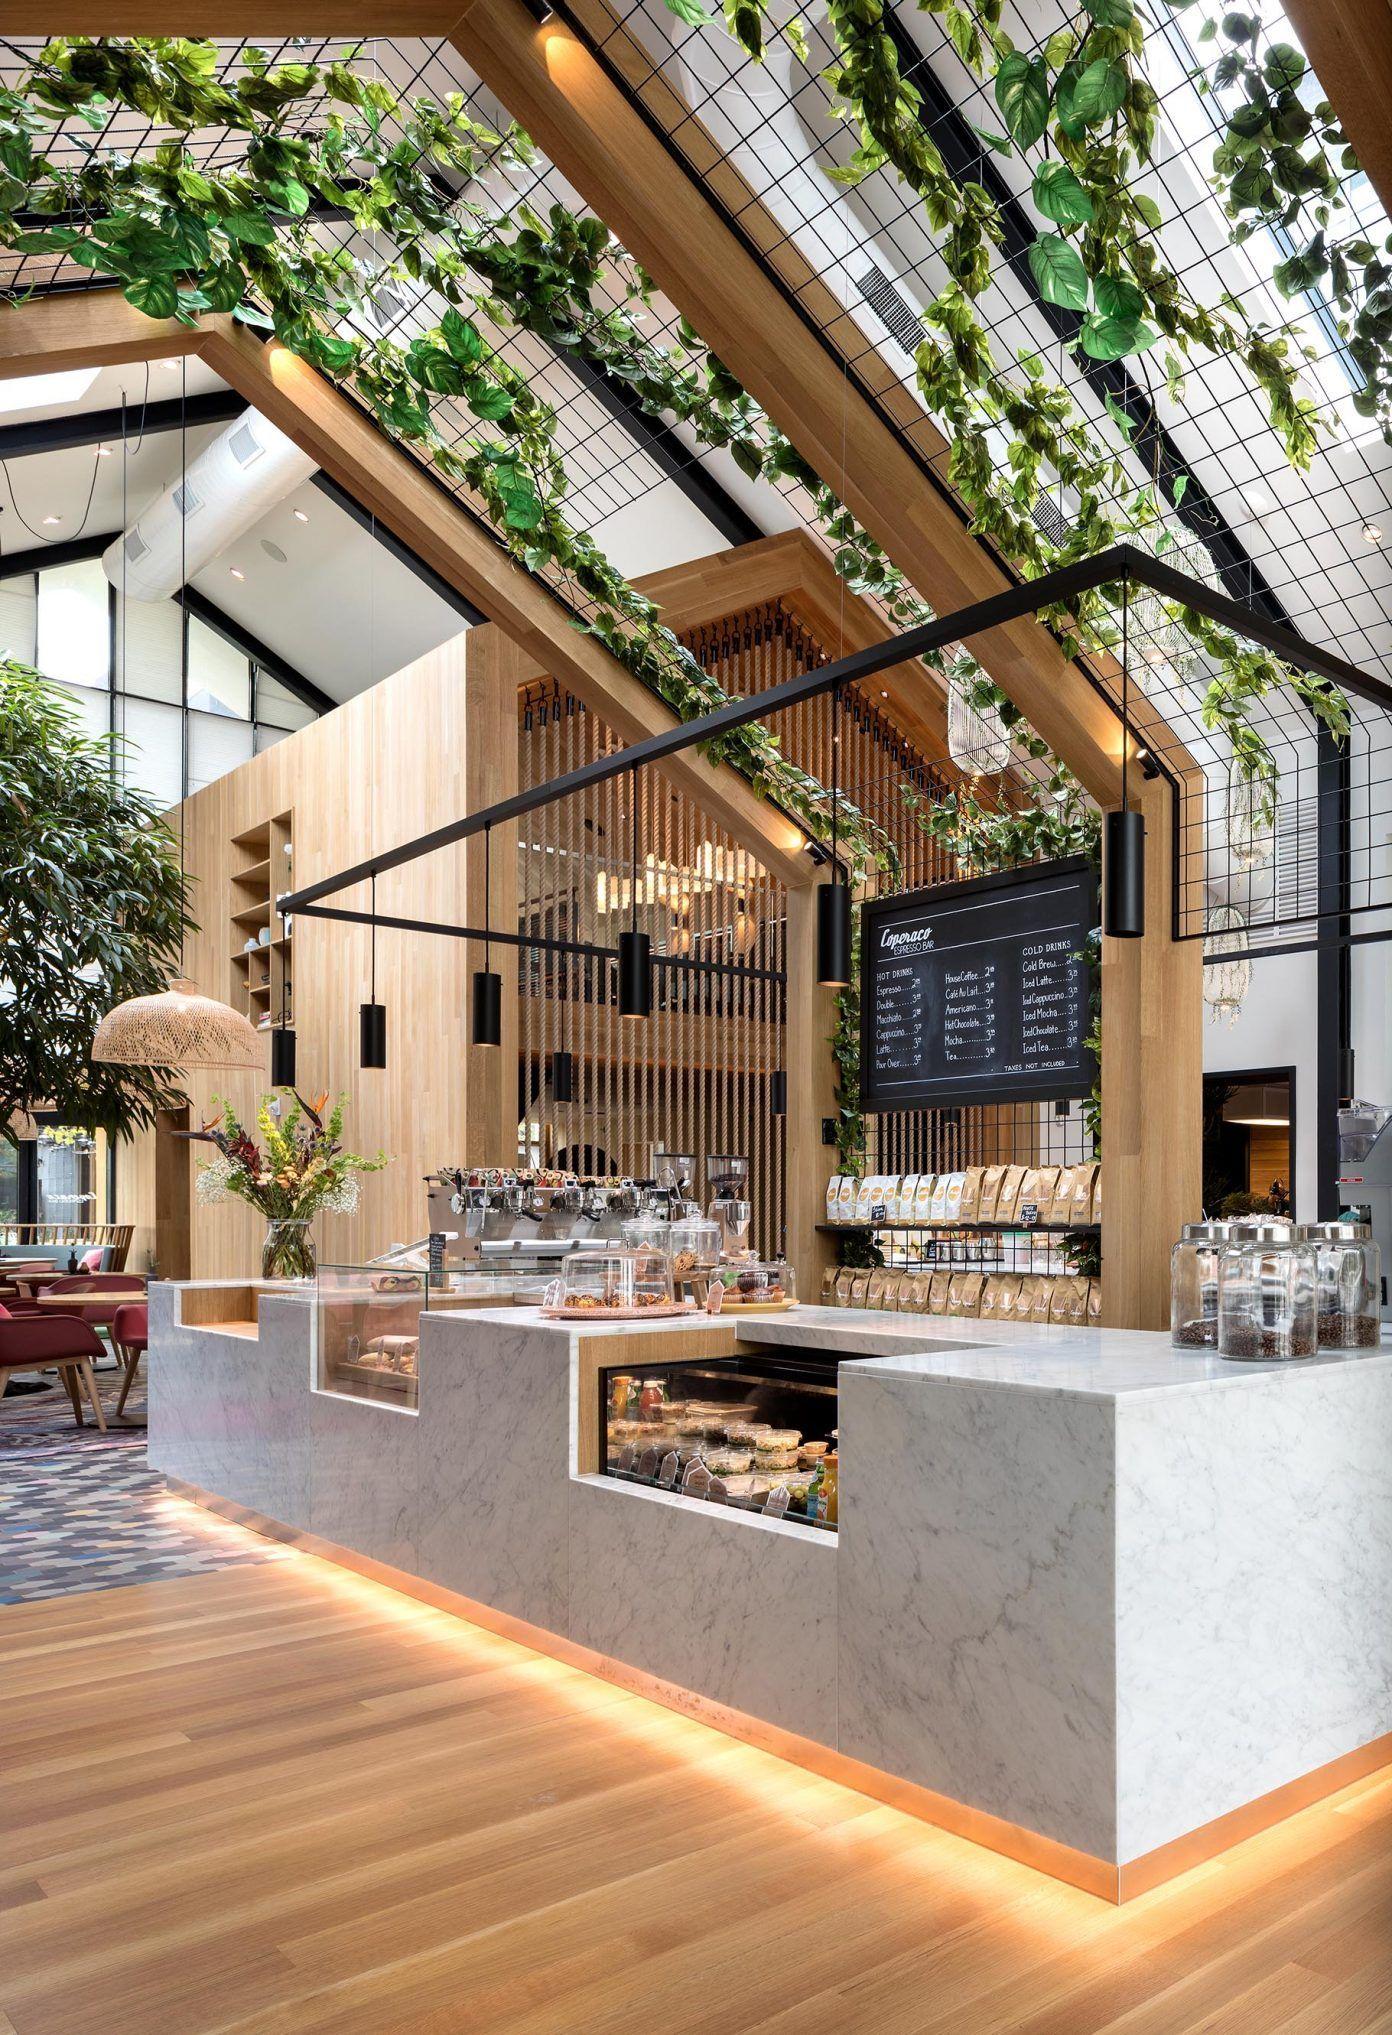 Coperaco Harrison Urby 02 | Design Inspiration | Pinterest | Cafes ...